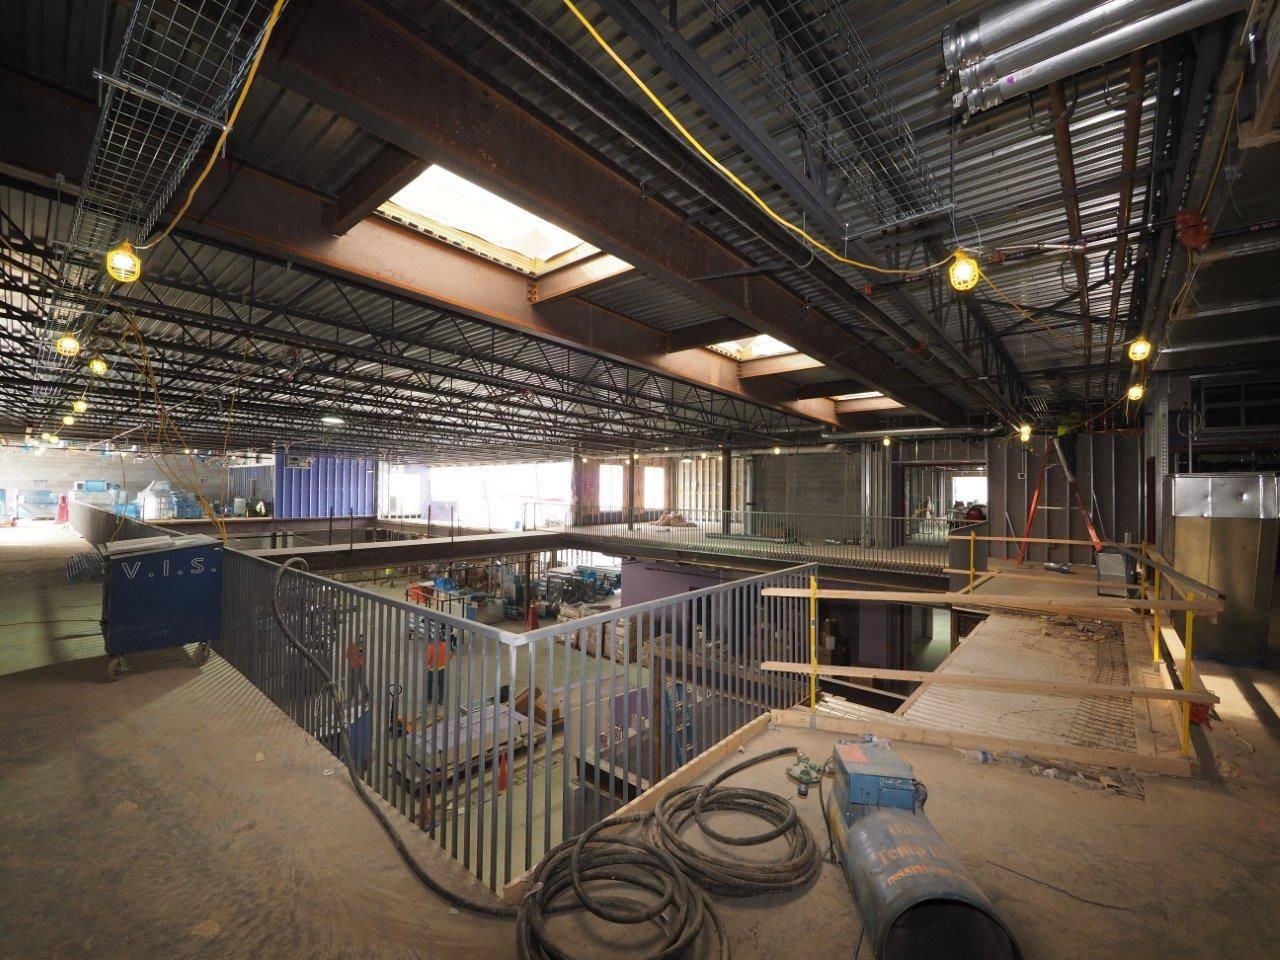 Inside the new Windermere Elementary School